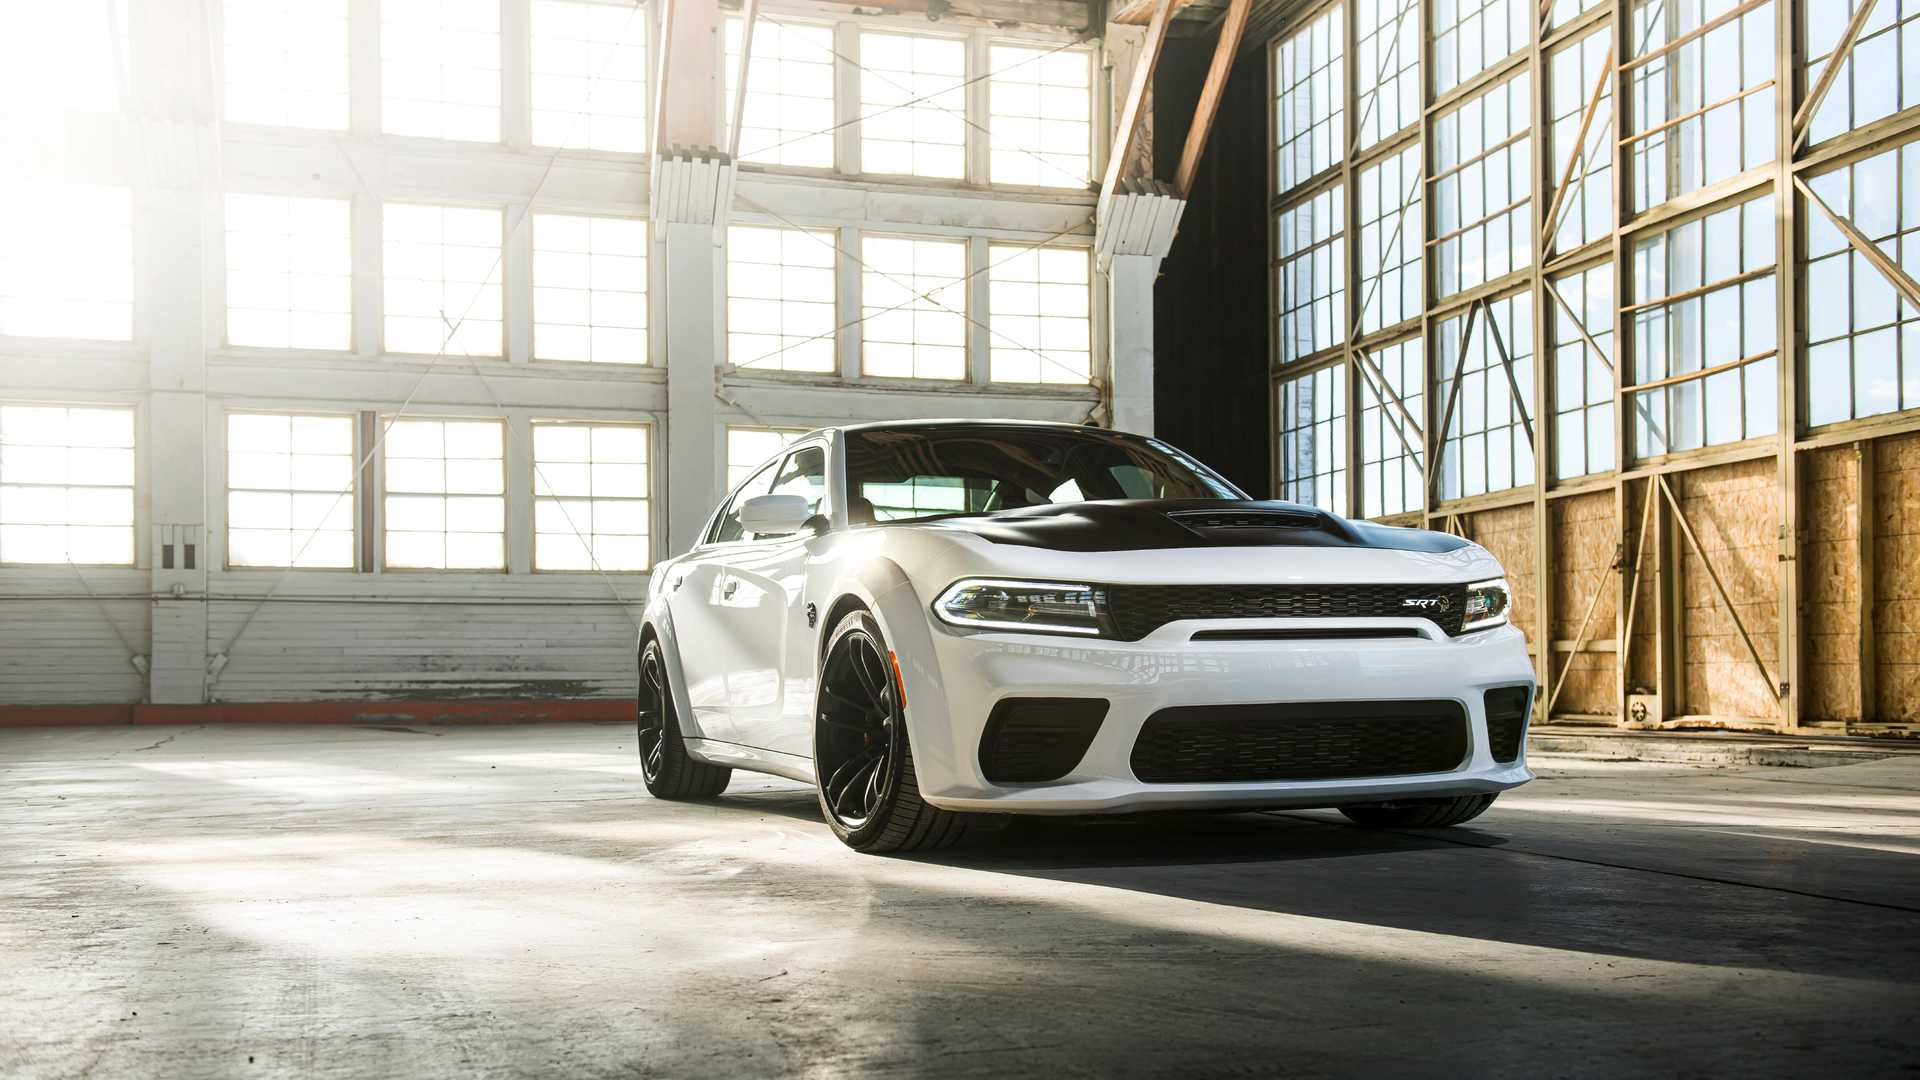 dodge hellcat redeye charger Dodge Charger Hellcat 2021 Spy Shoot - Best Car Garage